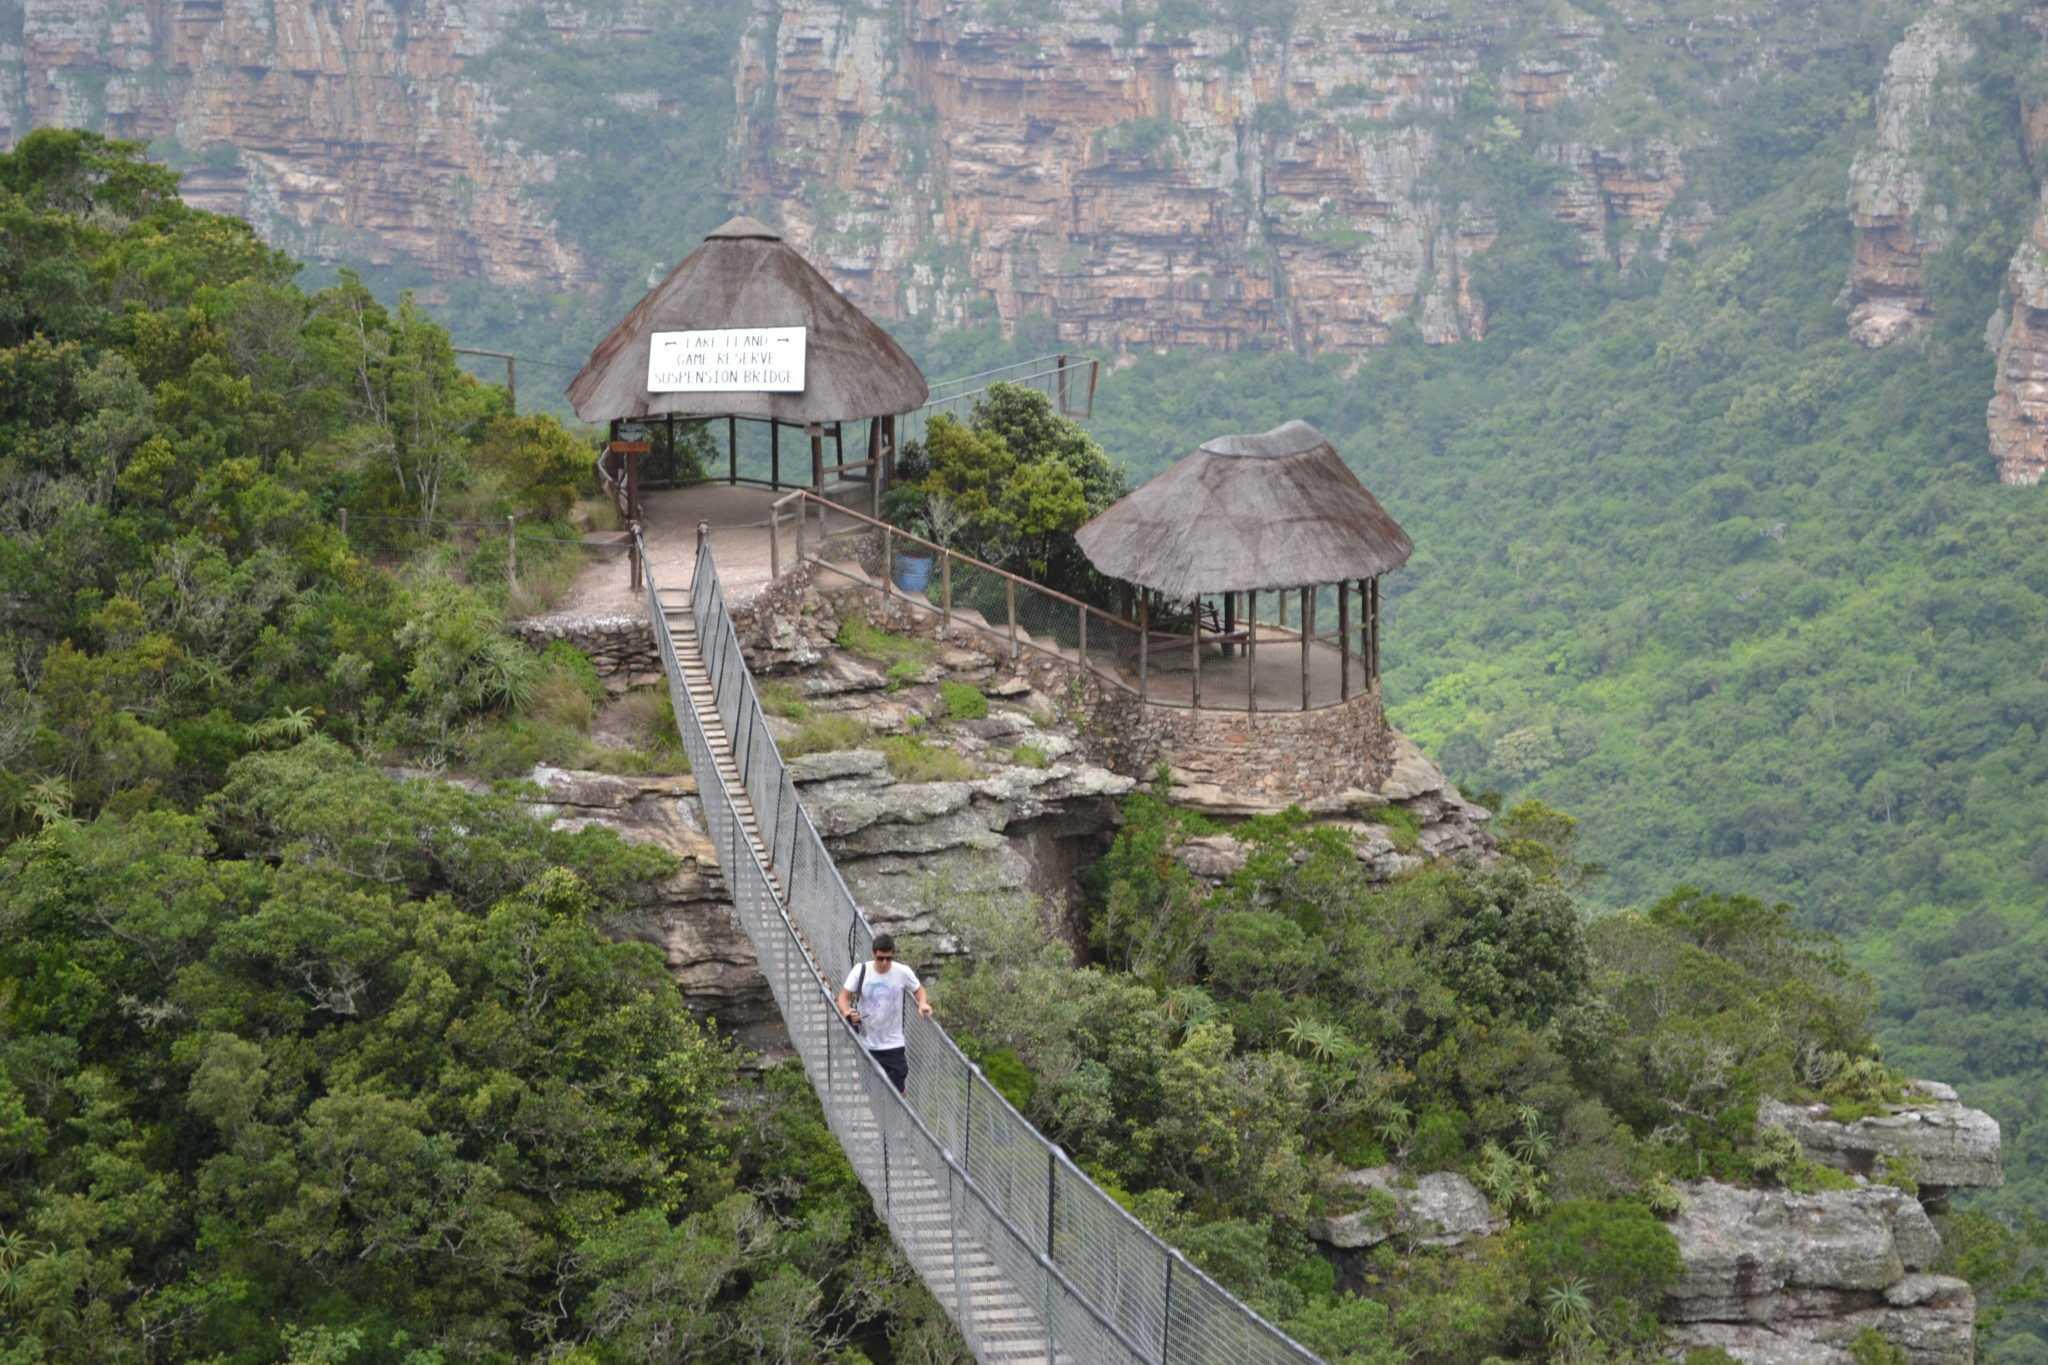 Tourist attractions in KwaZulu-Natal